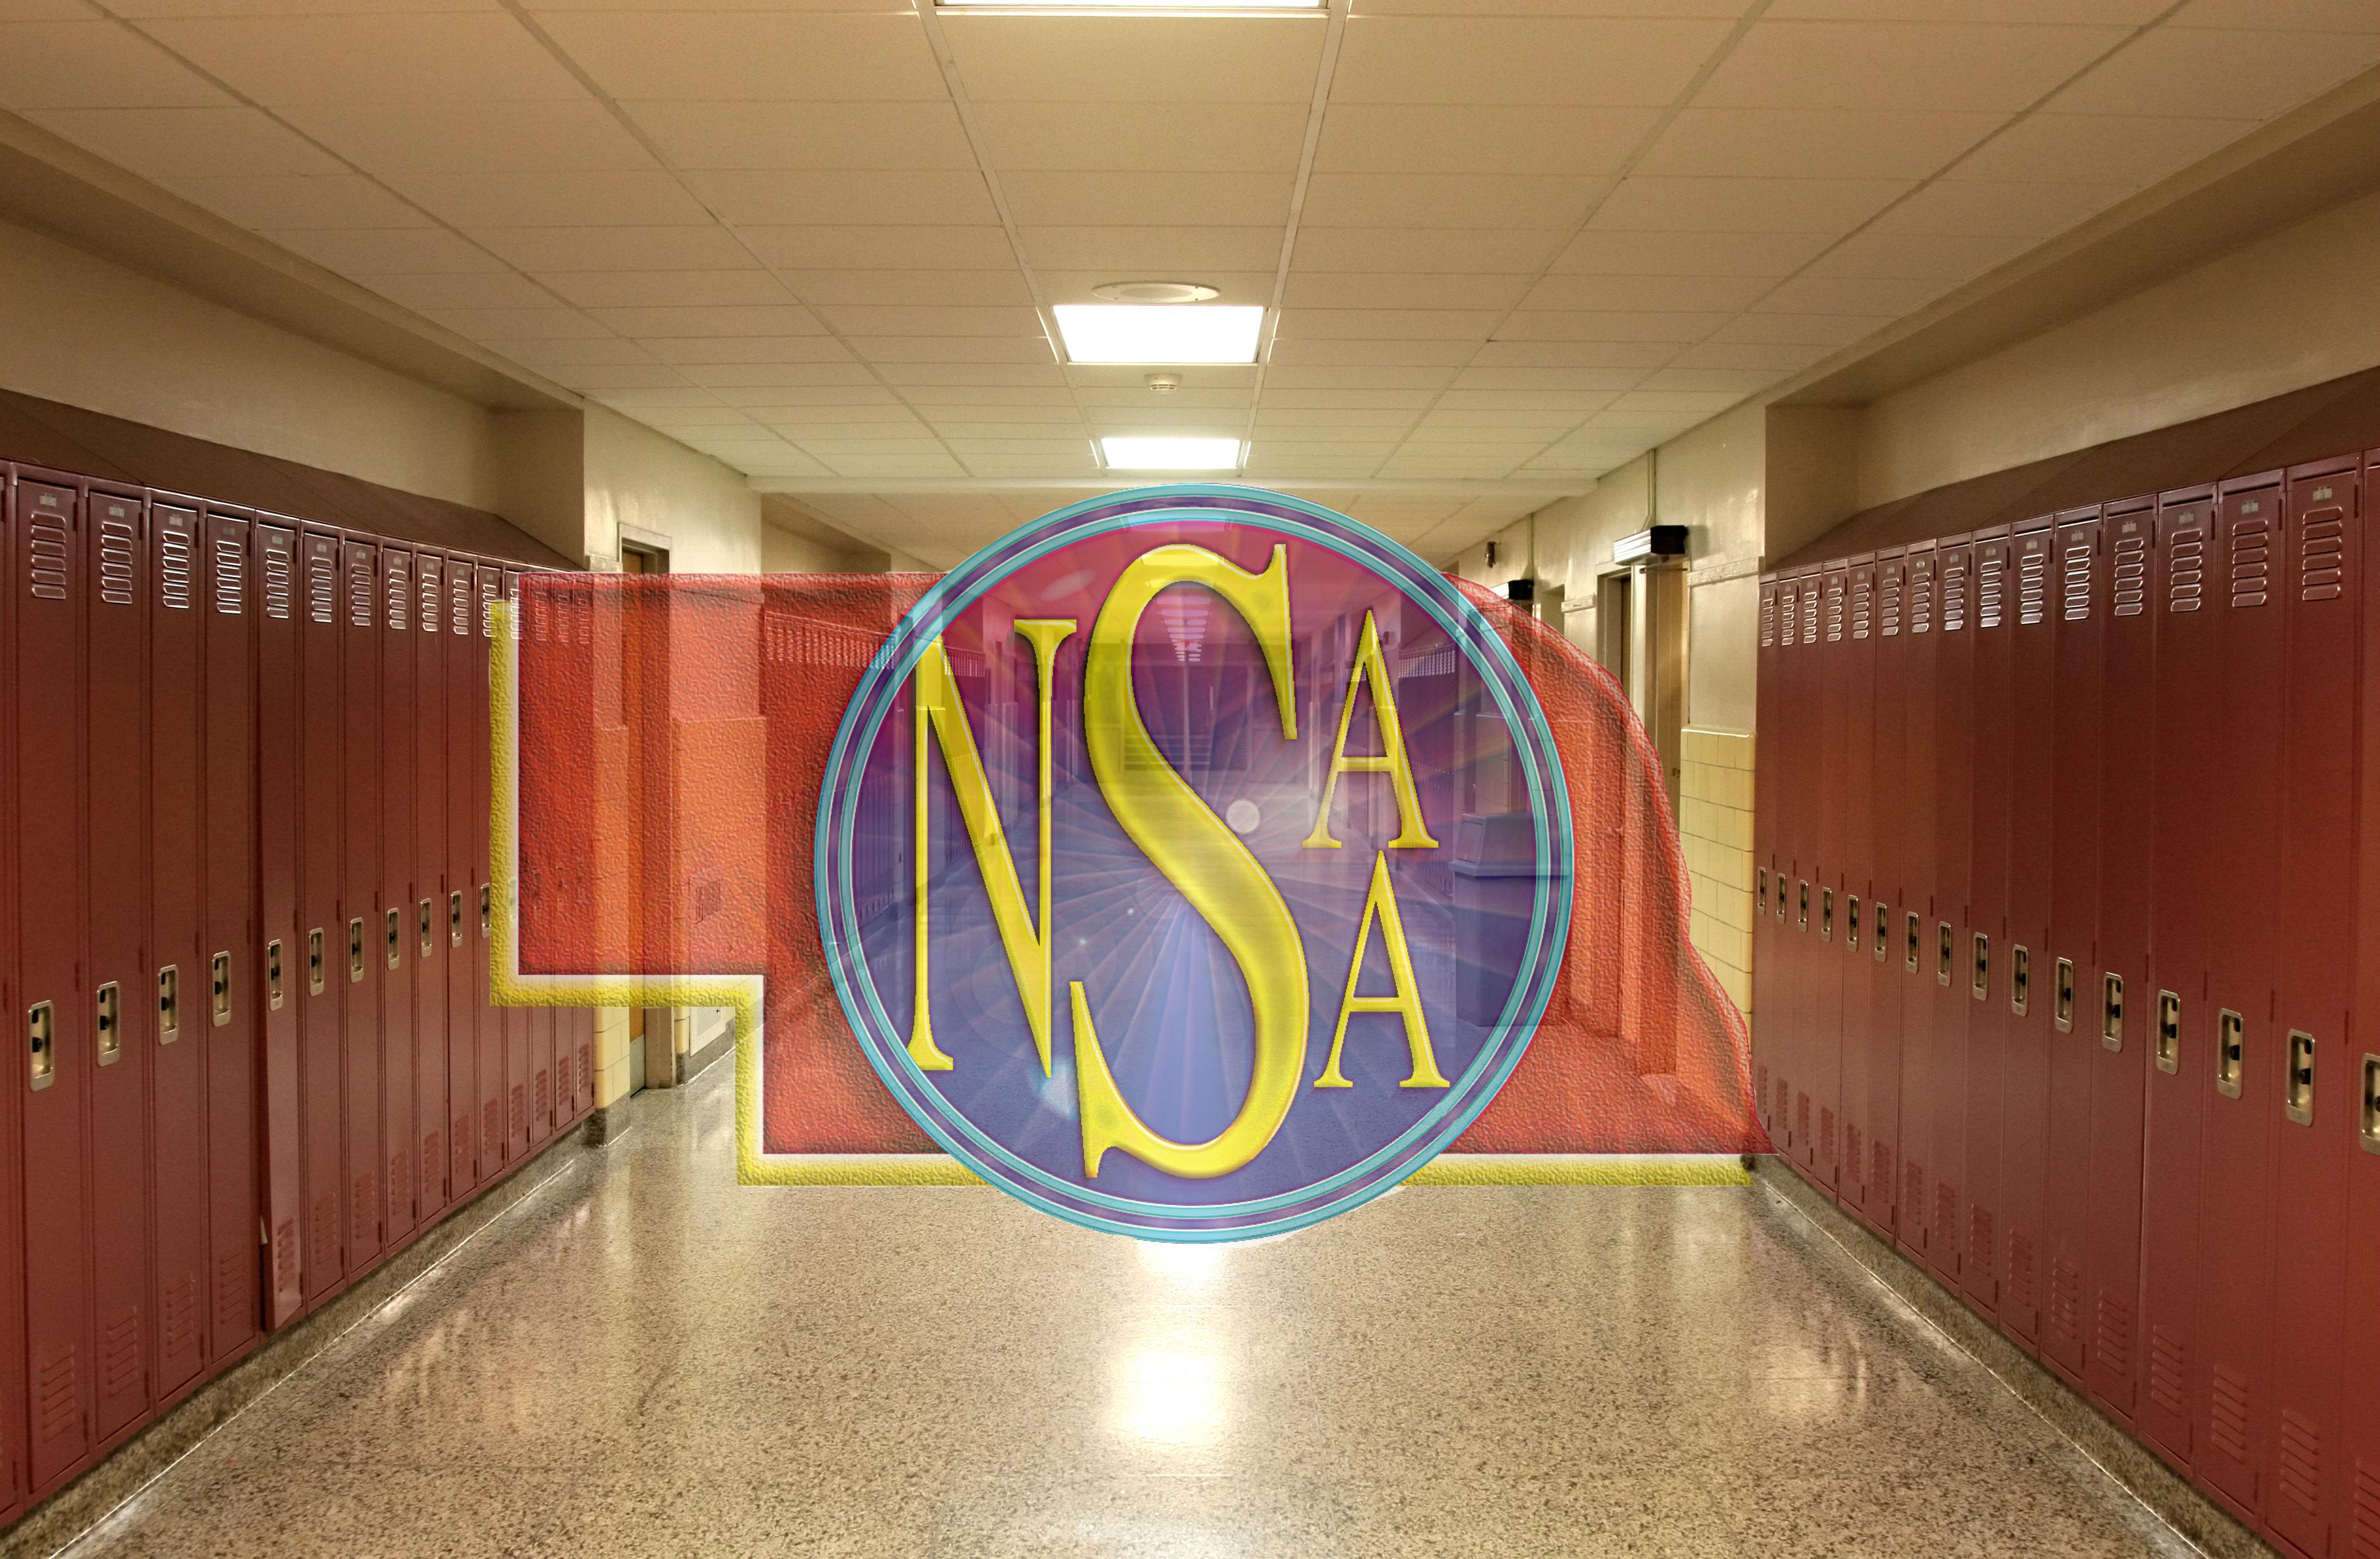 Empty School Hallway with Student Lockers